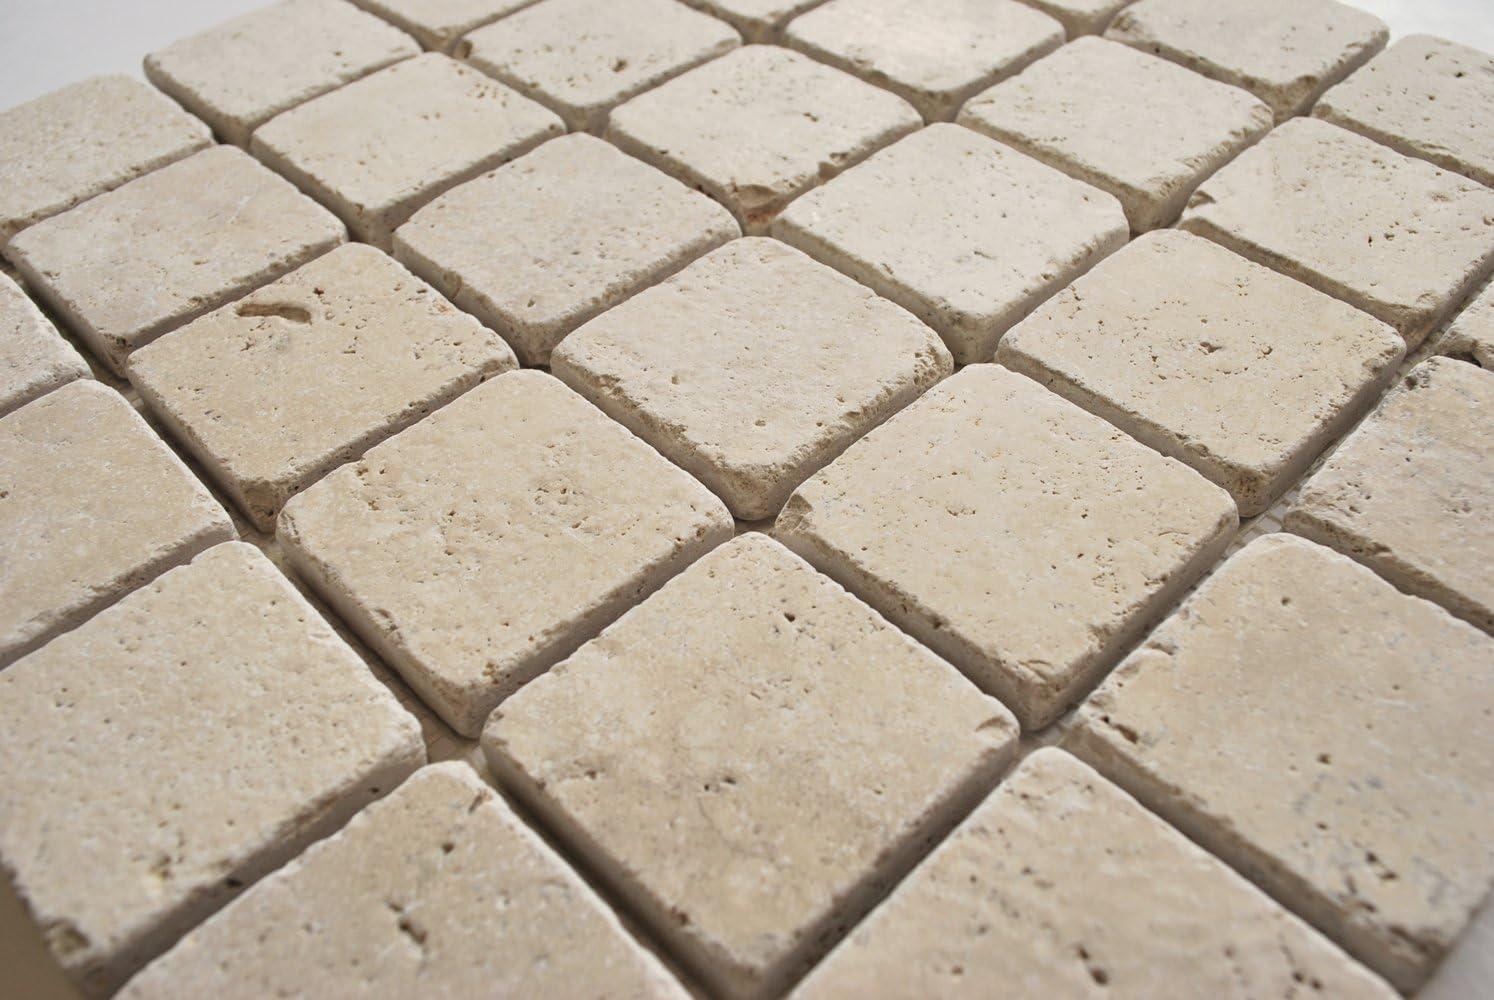 2x2 Light Ivory Tumbled Travertine Mosaic Tile Backsplash Wall Floor